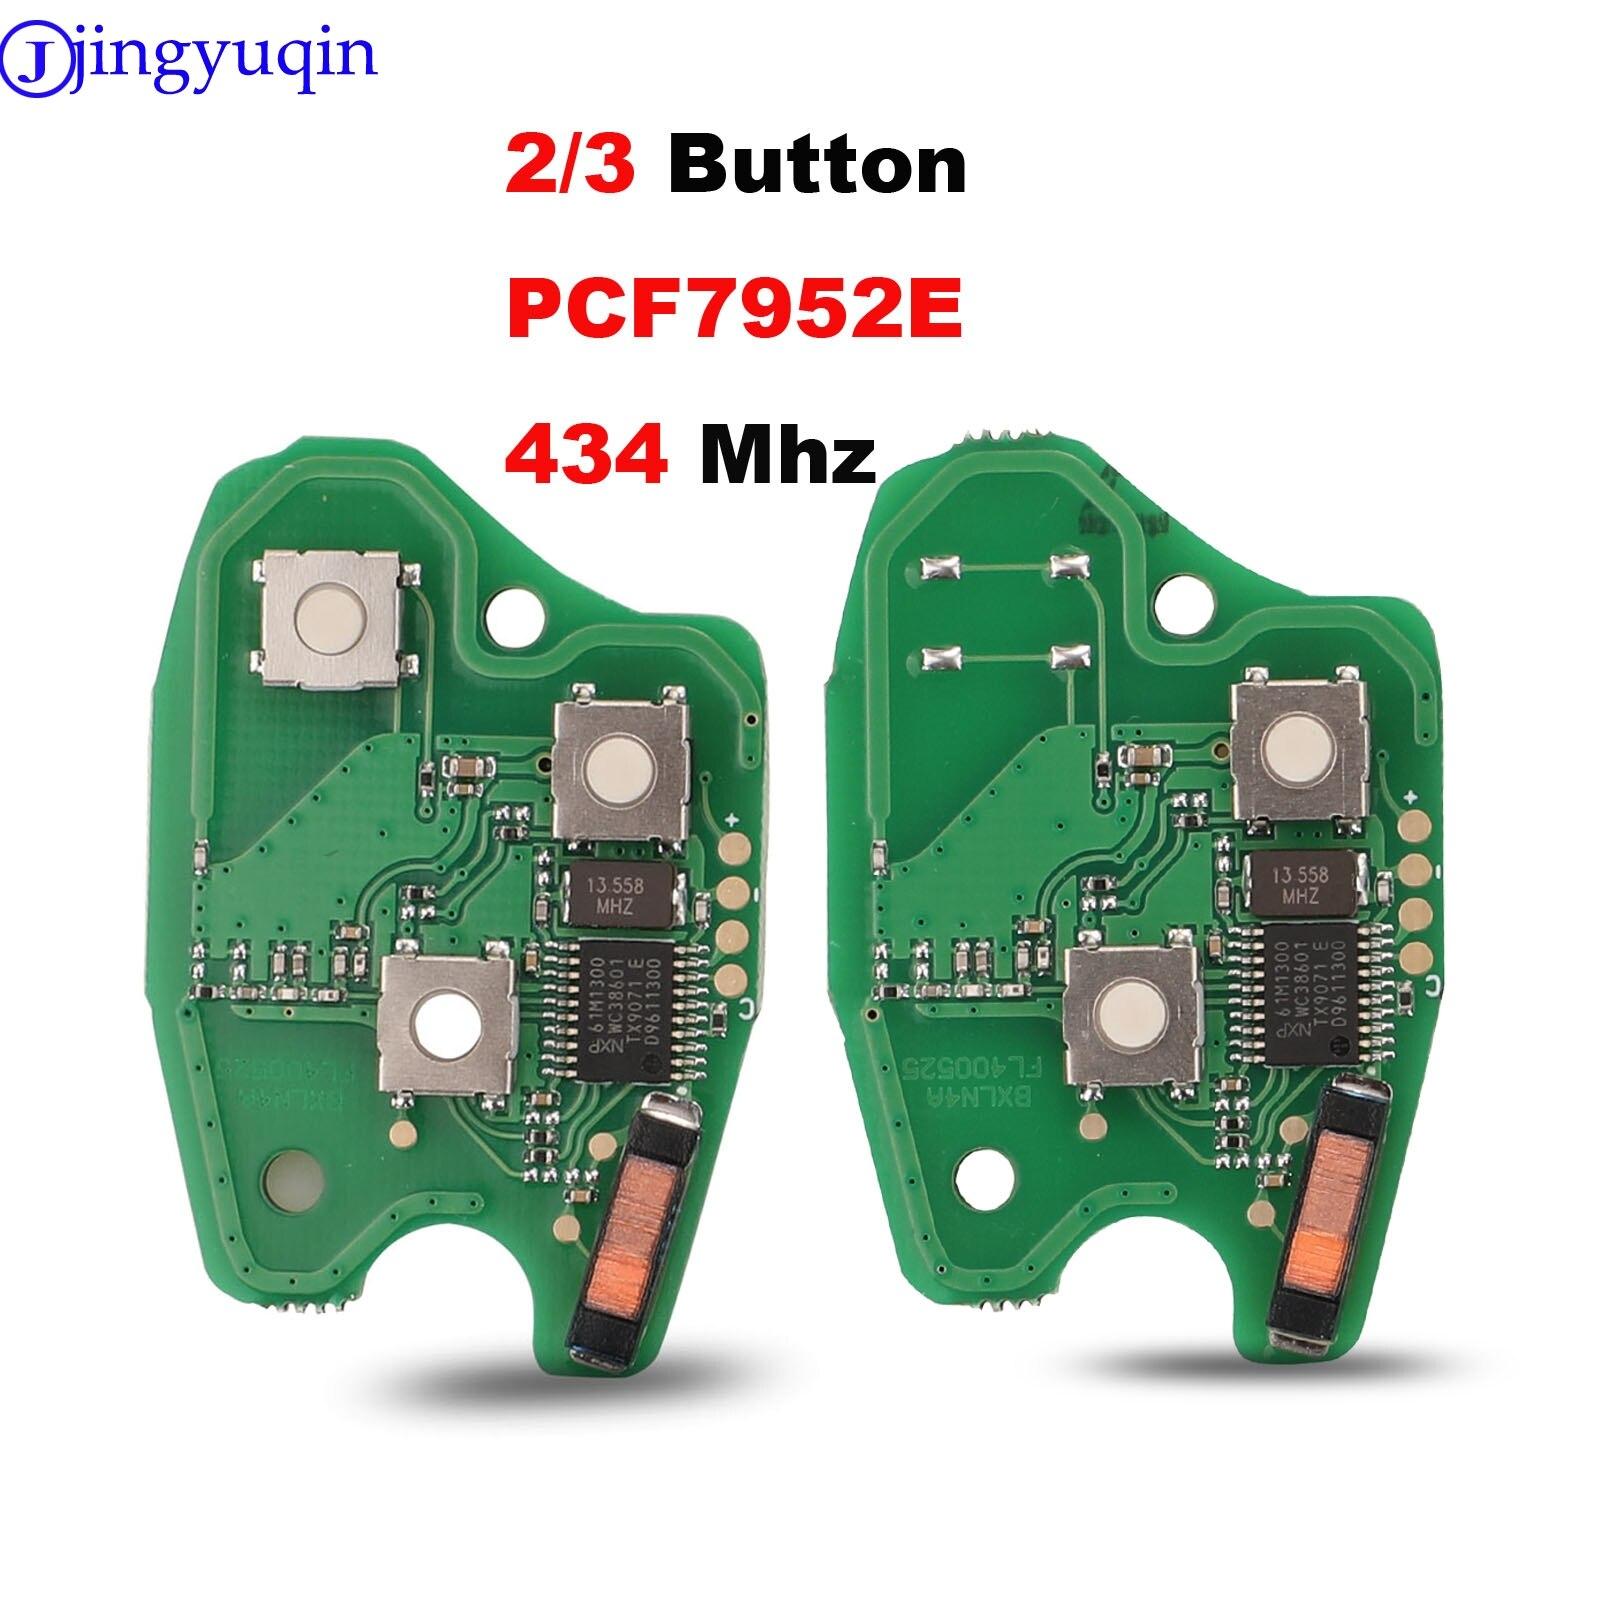 Placa de circuito de llave remota de coche jingyuqin 2/3BTN para Renault Clio Scenic Kangoo Megane PCF7952E Chip 434MHZ